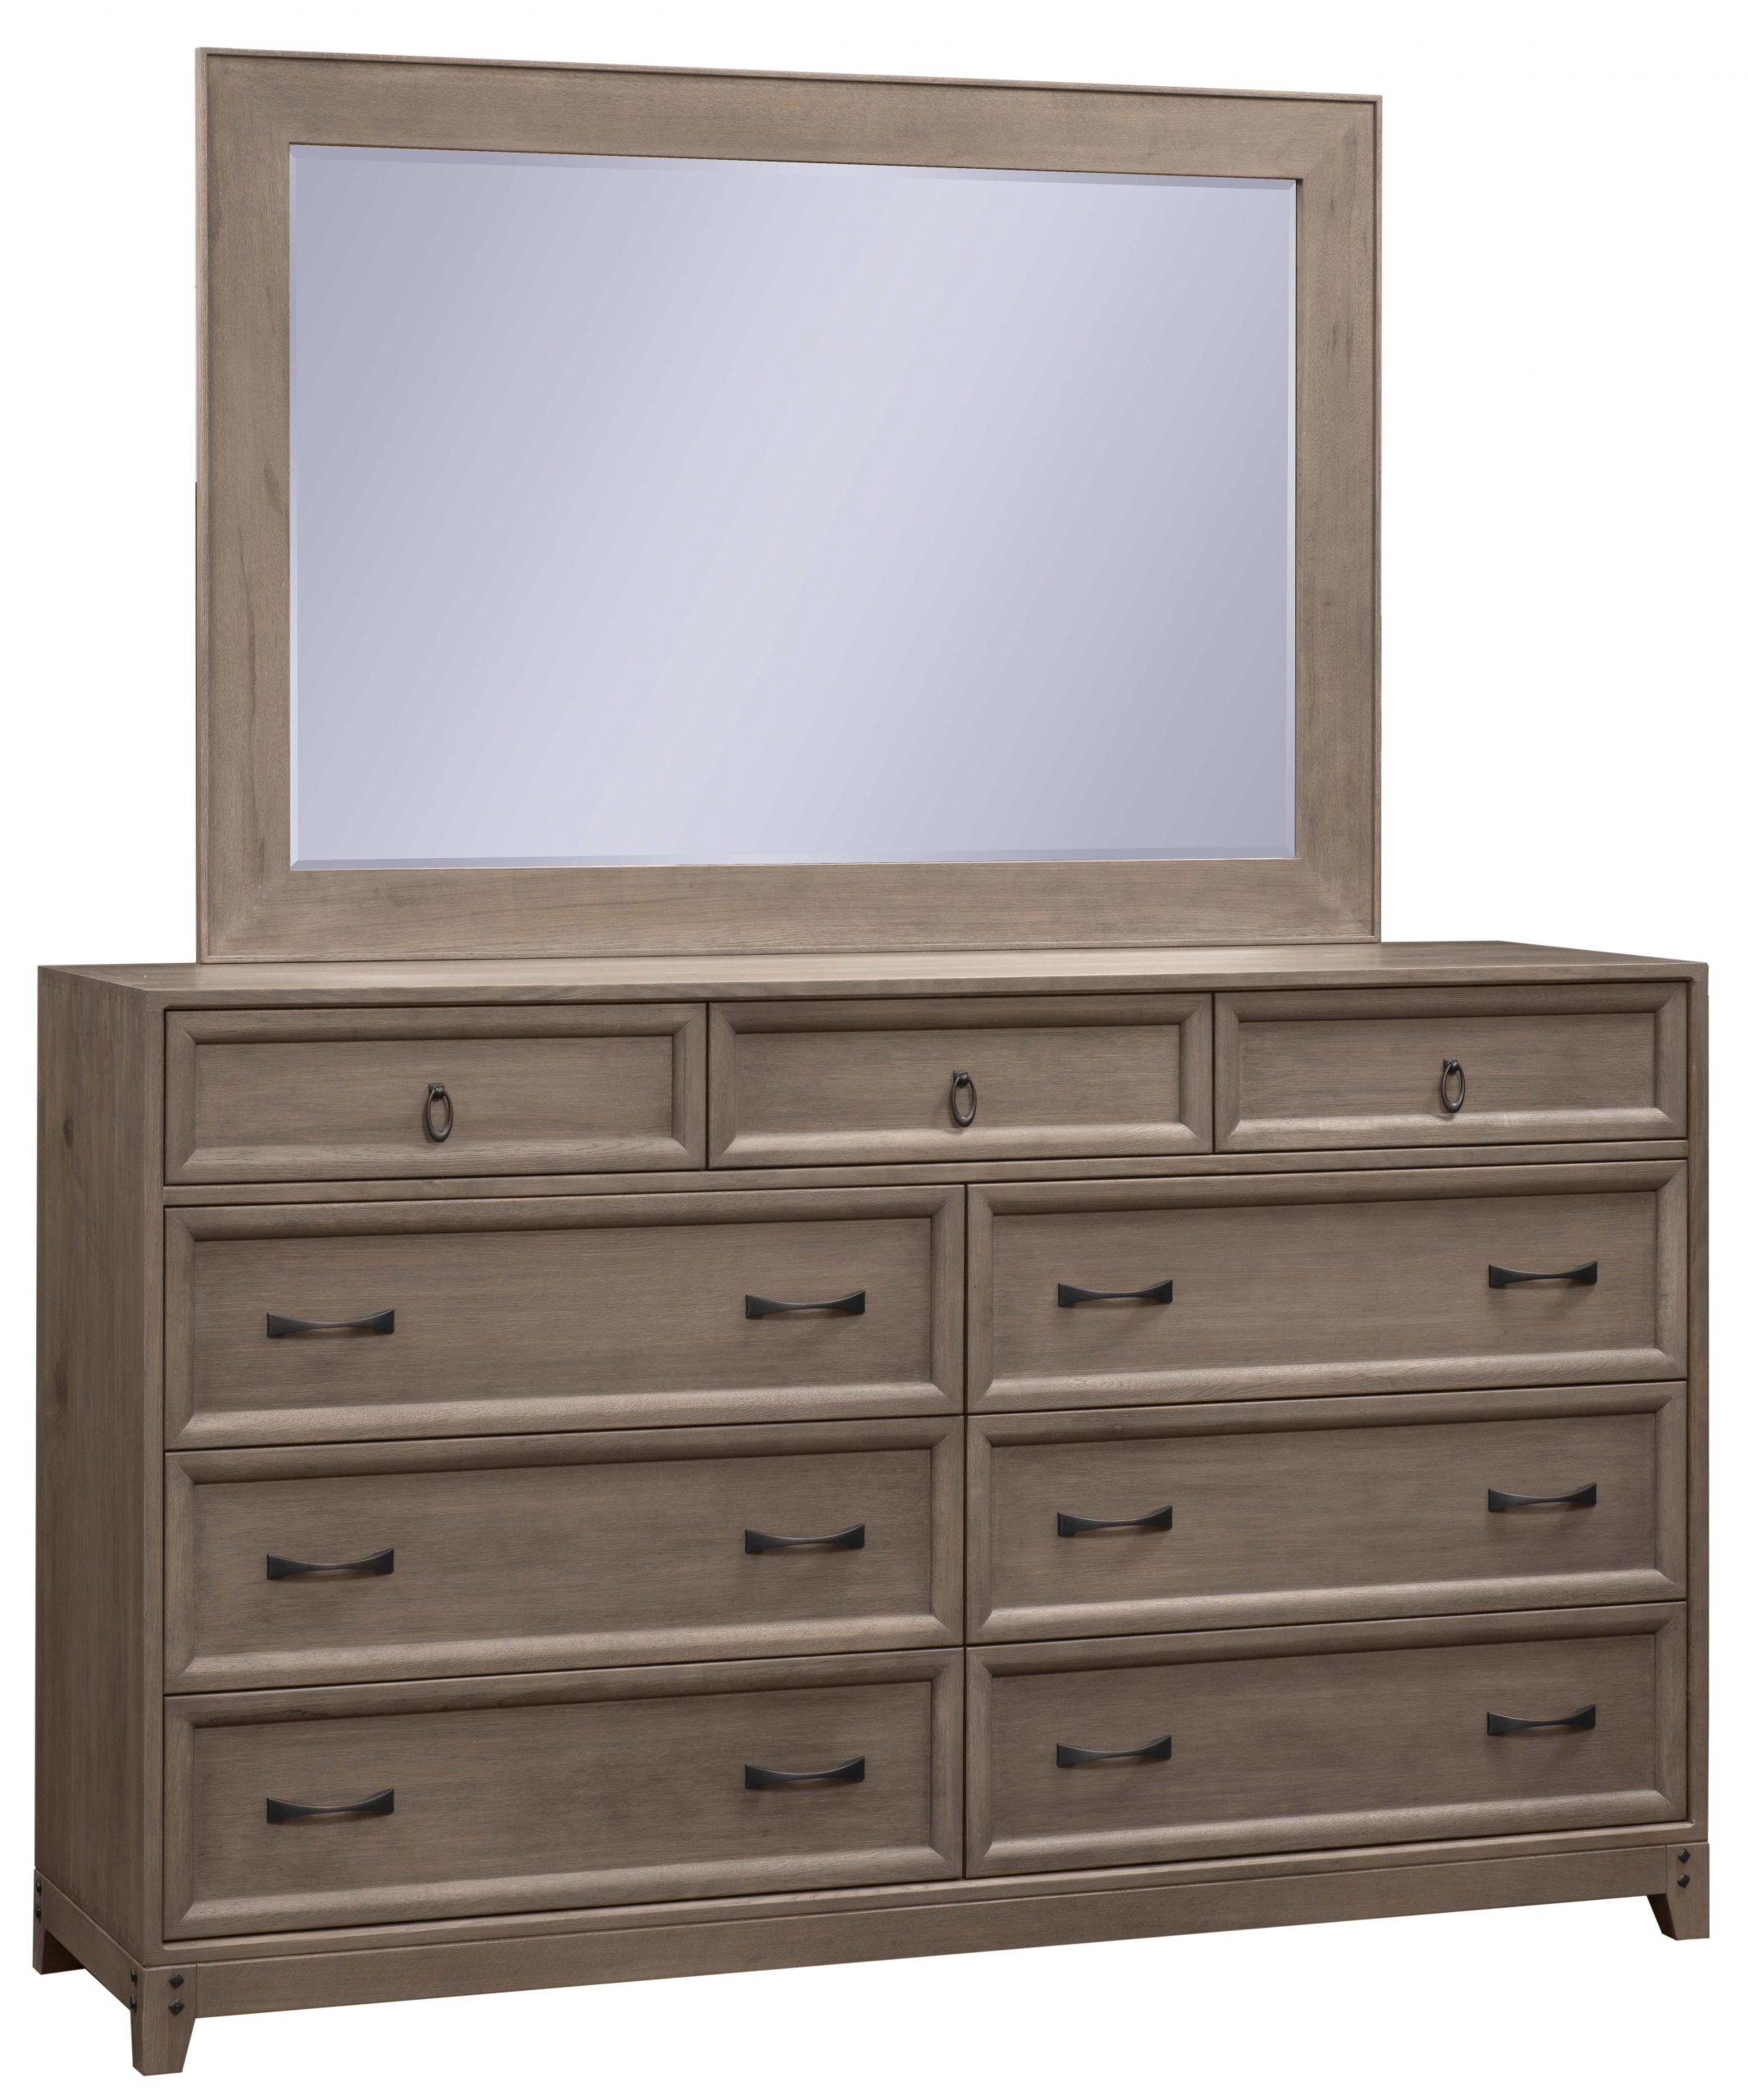 Glendale-5120-Double-Dresser